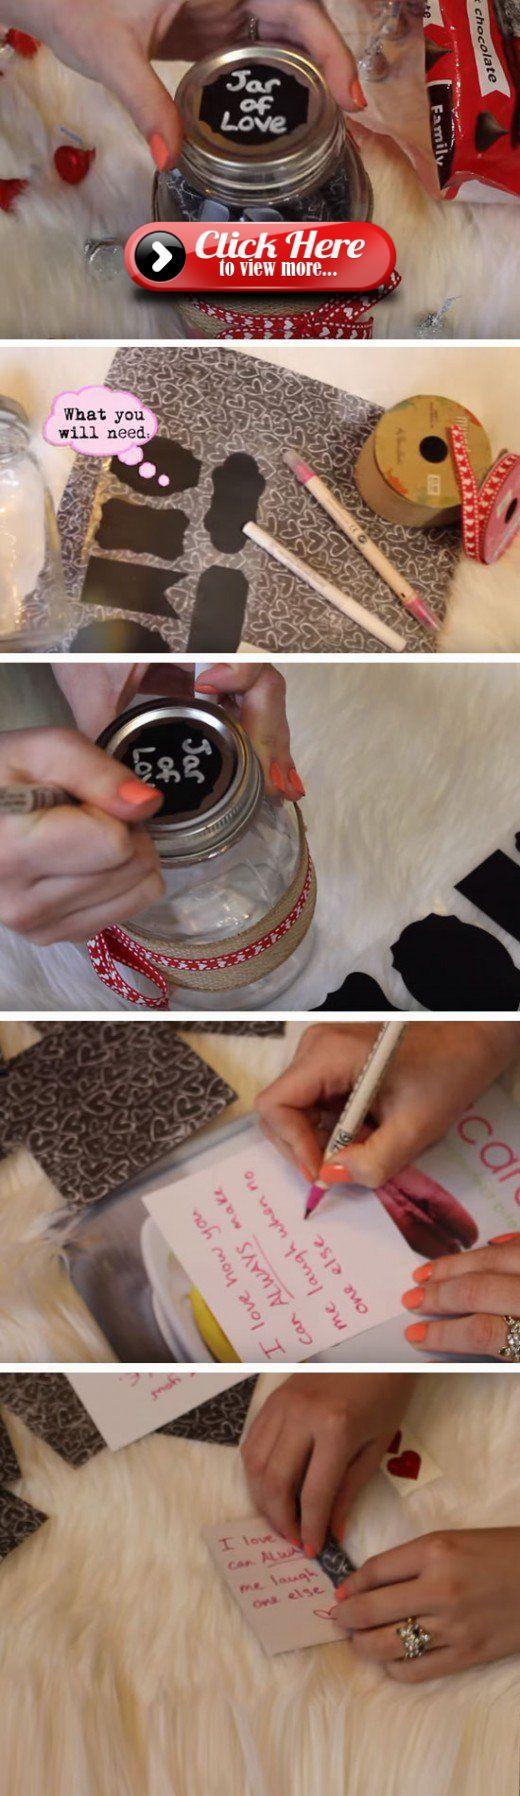 Jar of Love | Easy DIY Anniversary Gift Ideas for Him